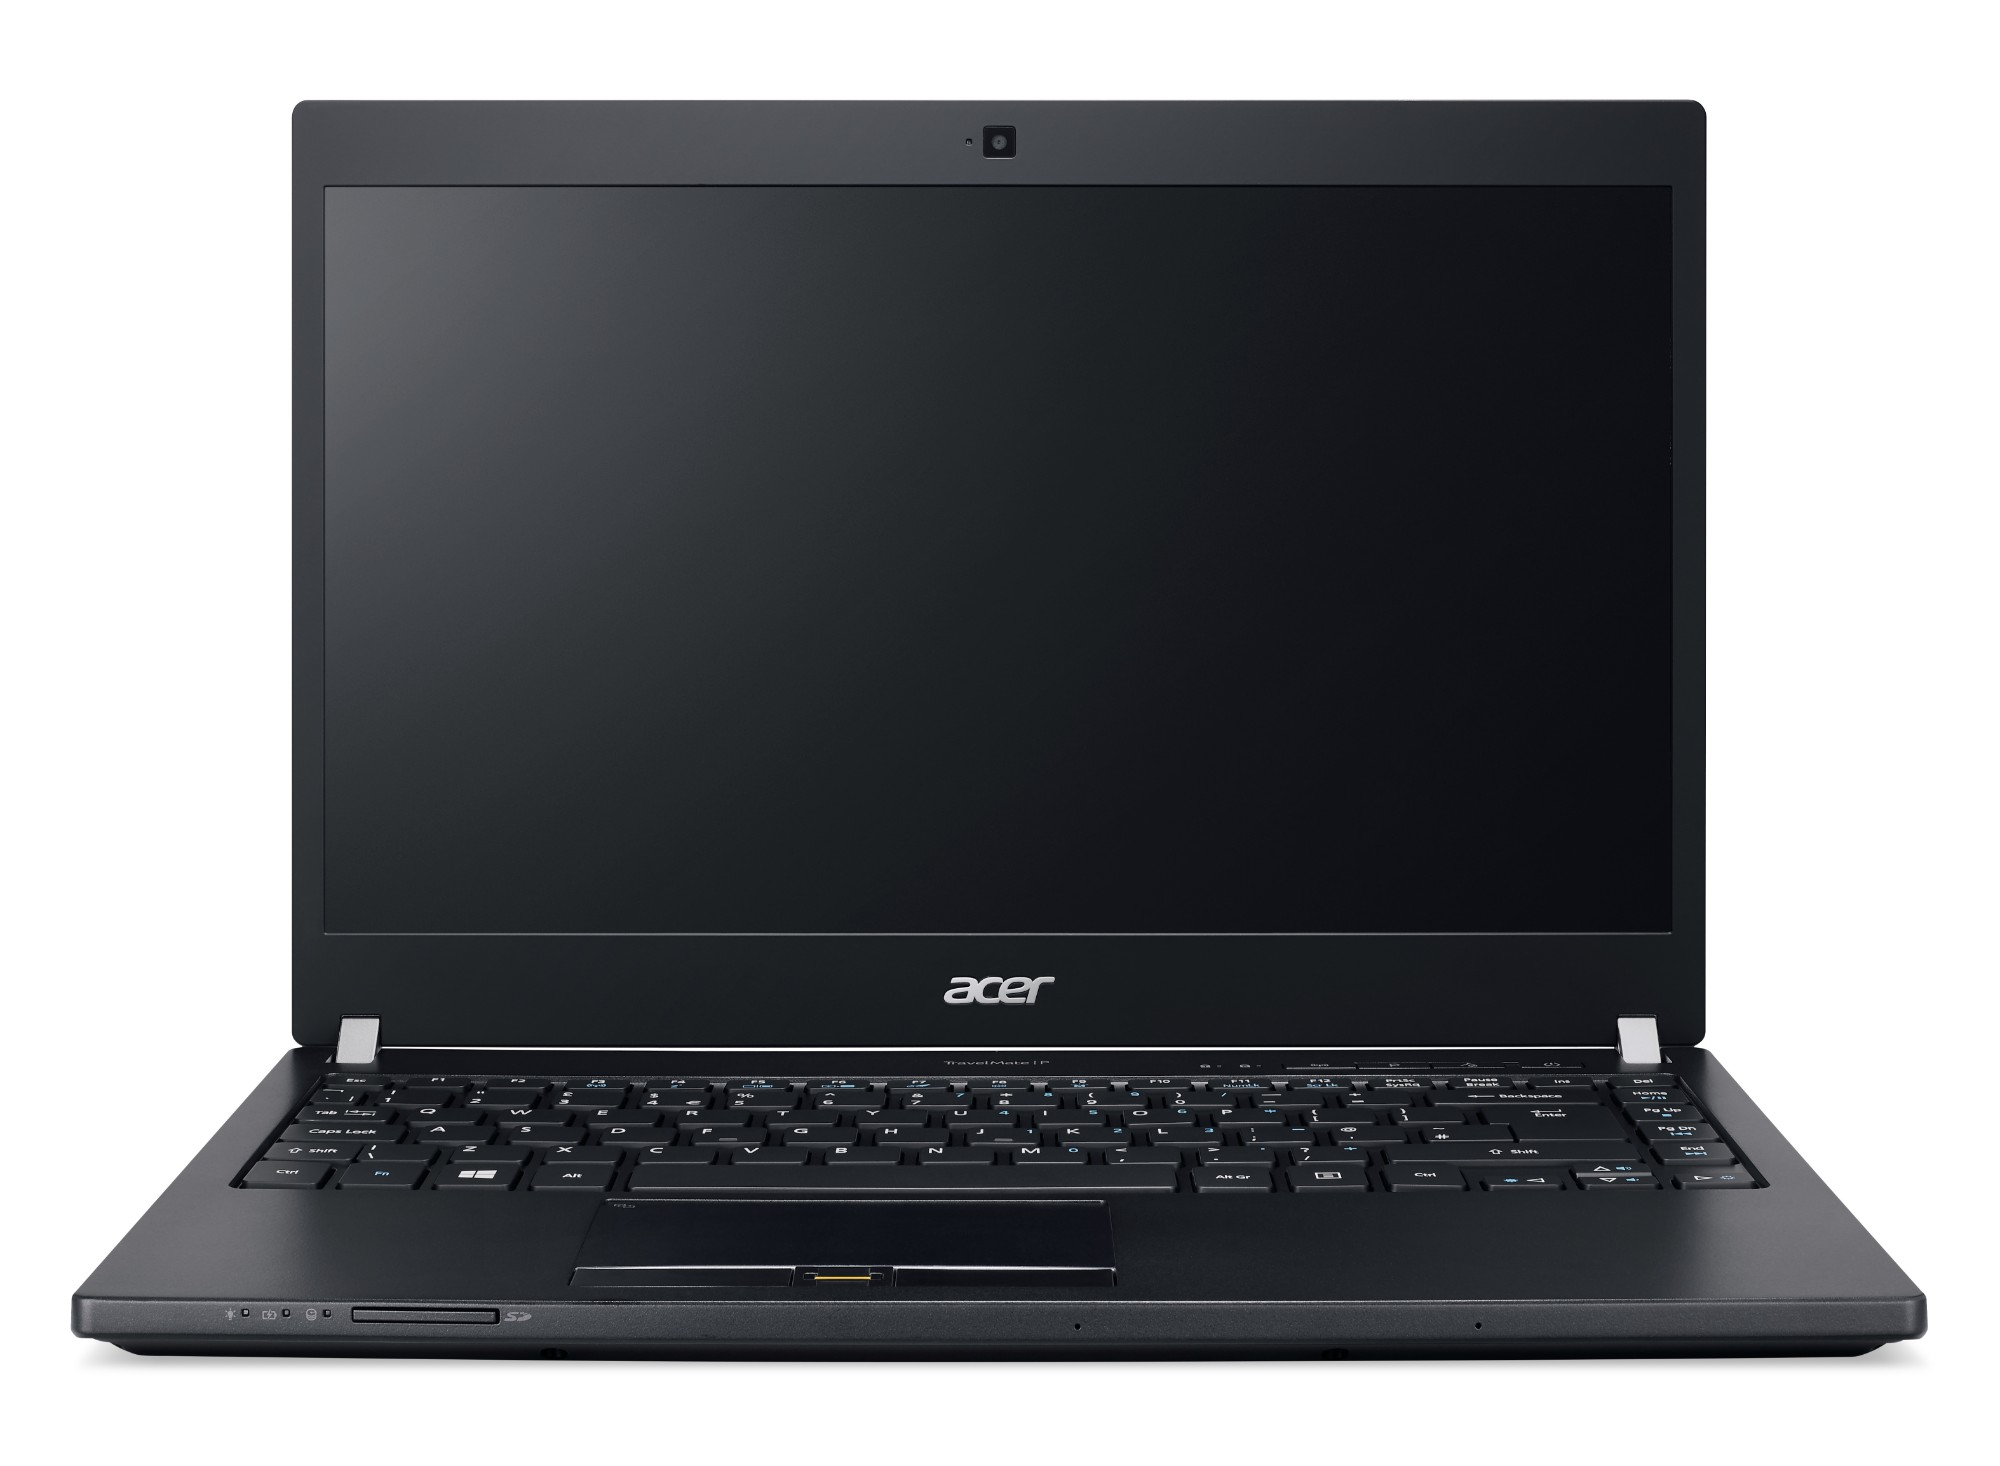 Acer TravelMate P648-G3-M-59R3 Black Notebook 35.6 cm (14